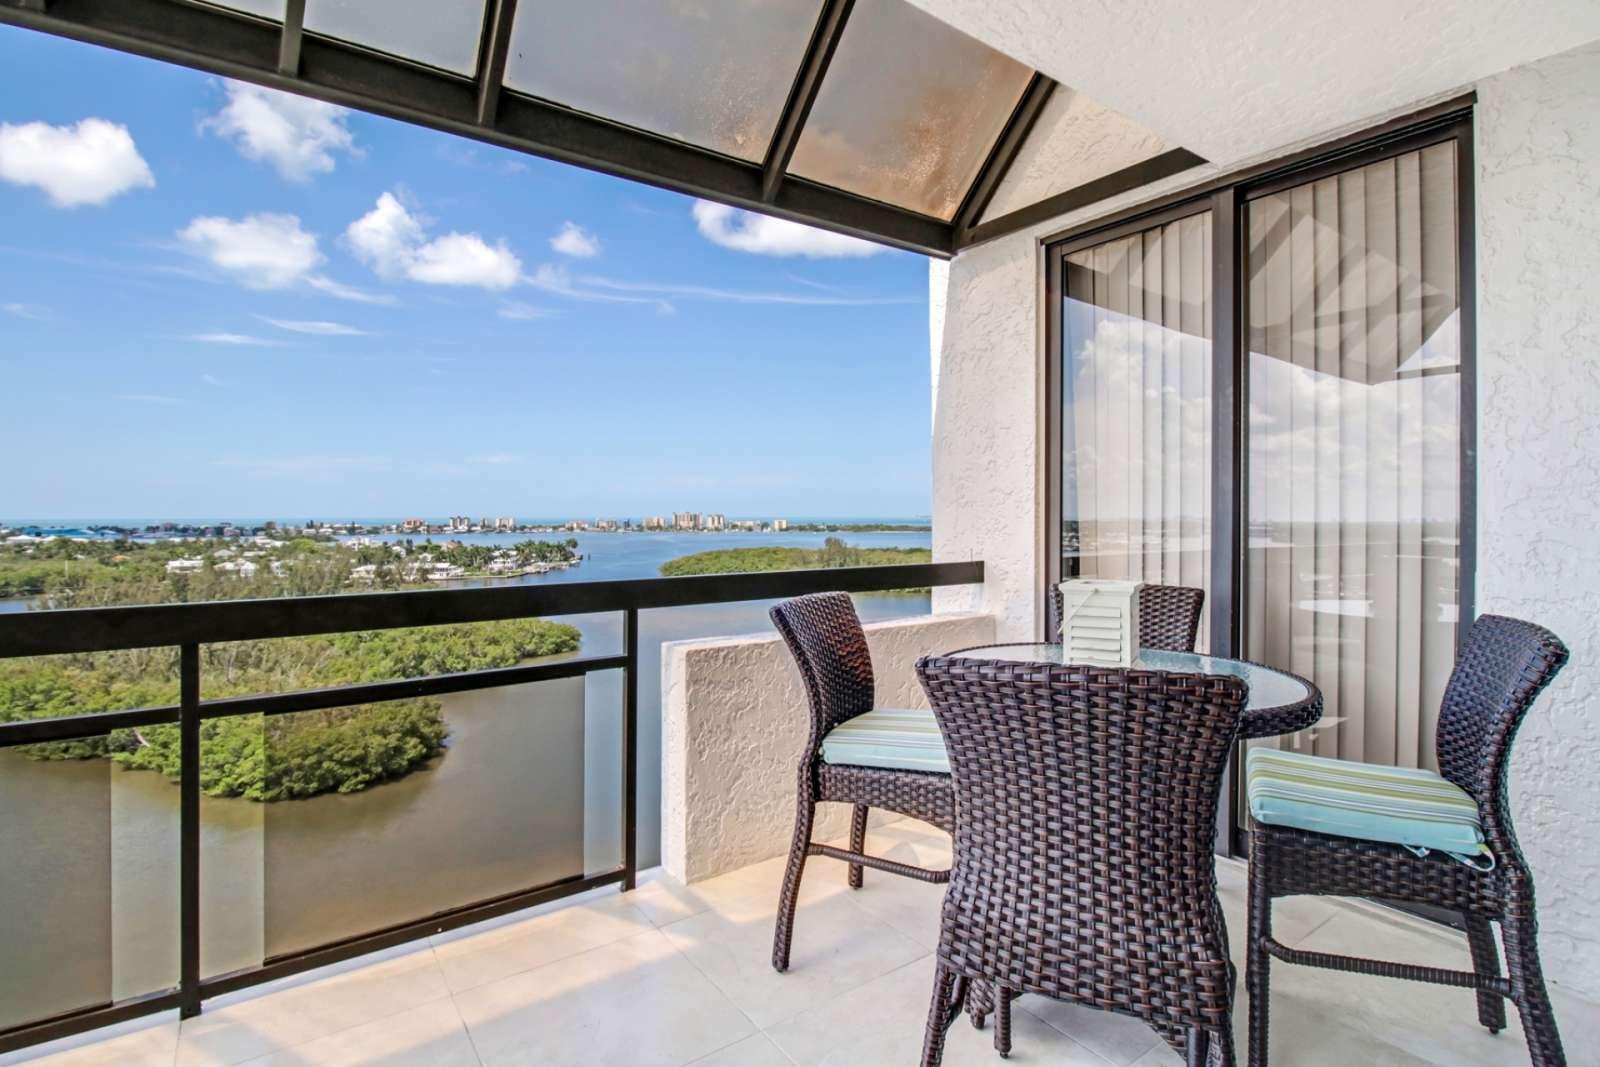 Fort Myers Beach Vacation Rental Beach Vacation Rentals Penthouse Condo Beachfront Rentals